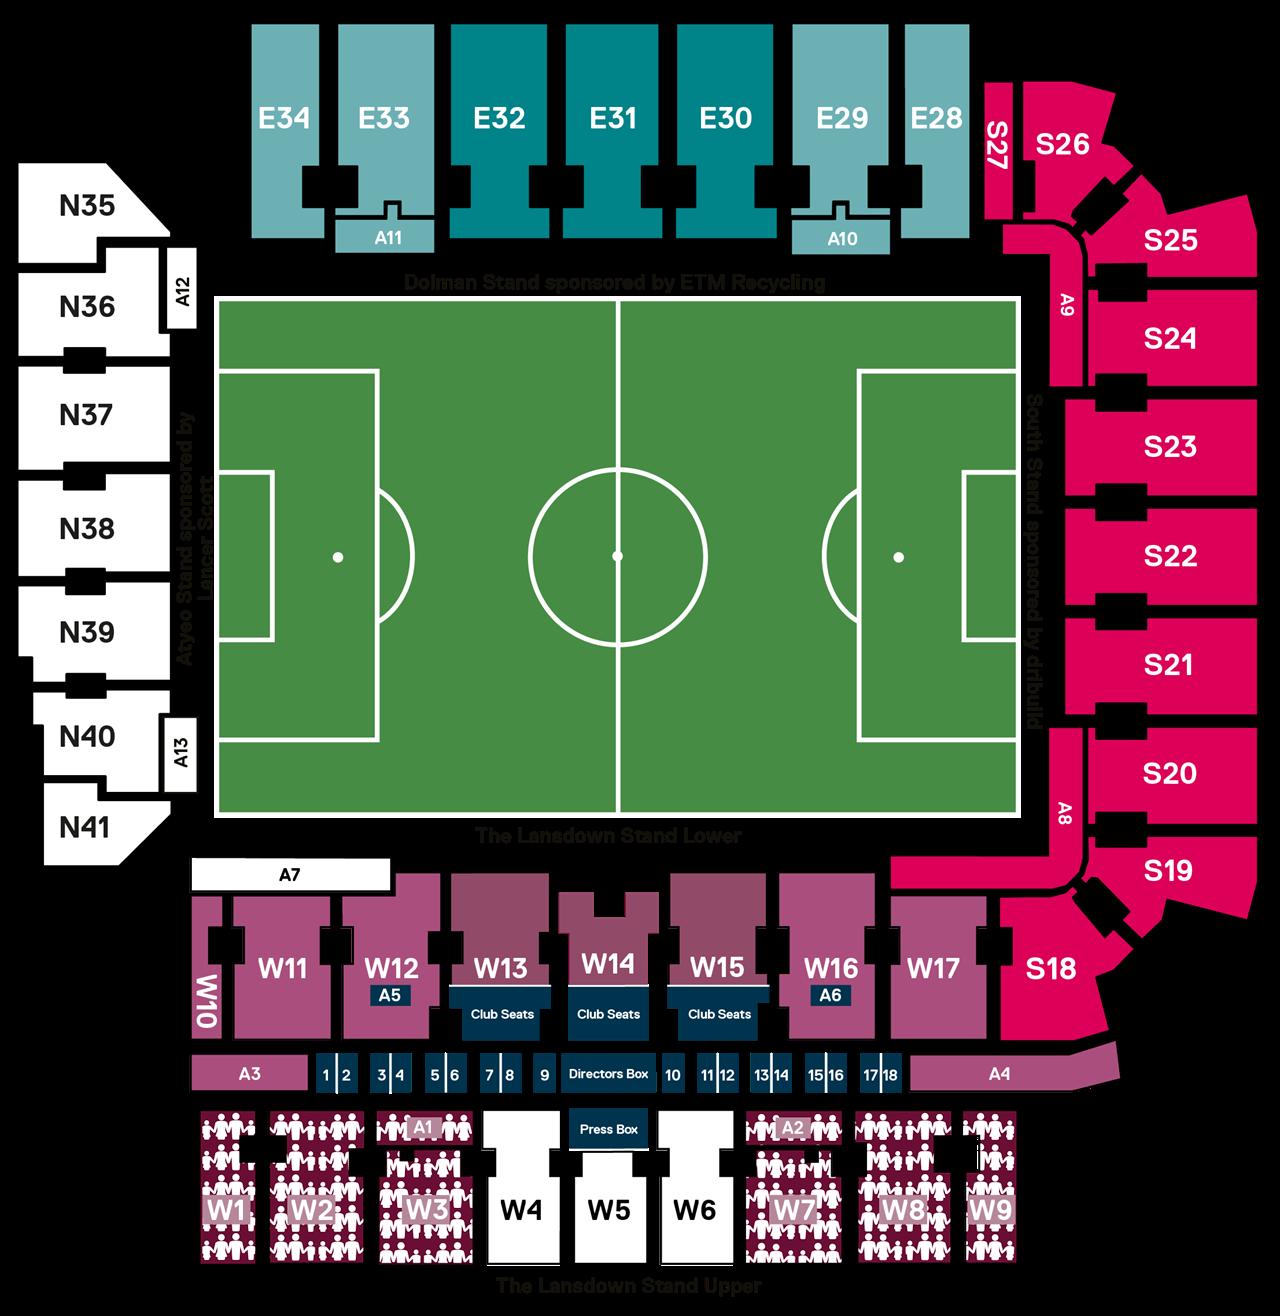 Football League Ground Guide - Bristol City FC - Ashton Gate